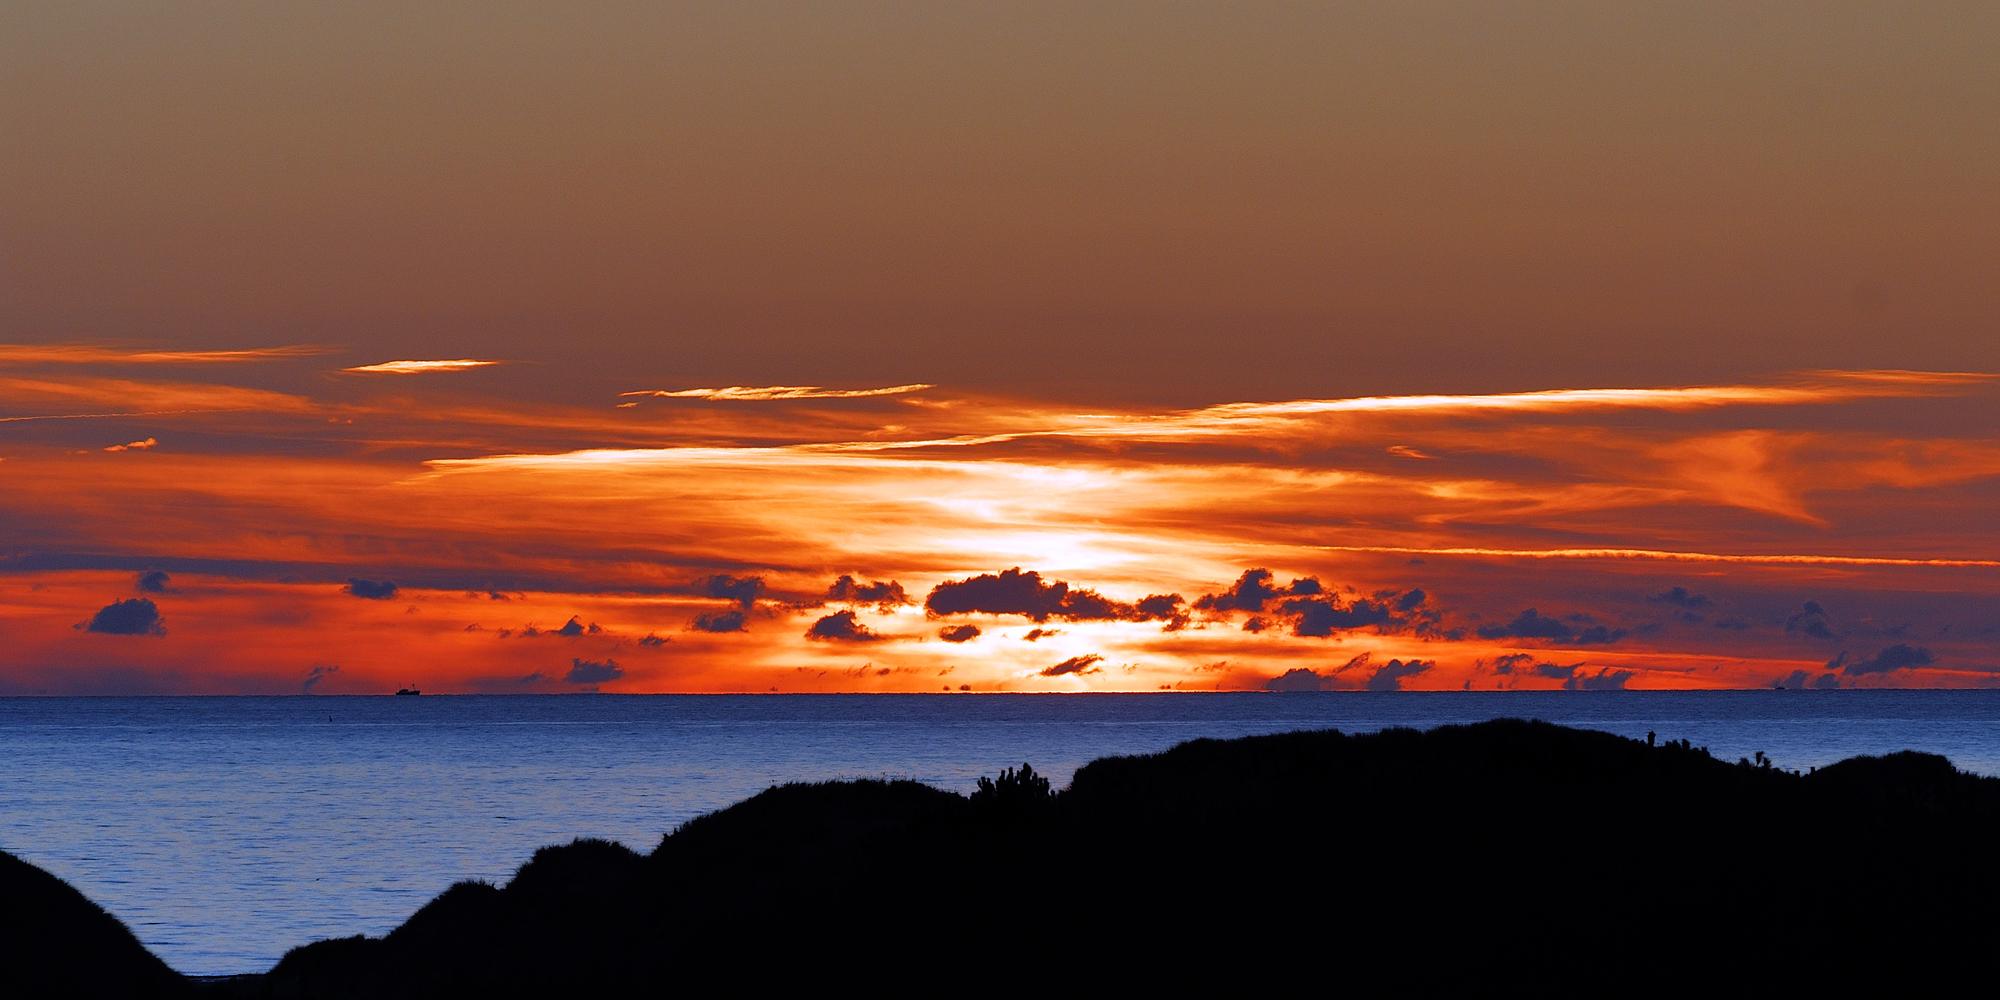 Sonnenuntergang im Oktober